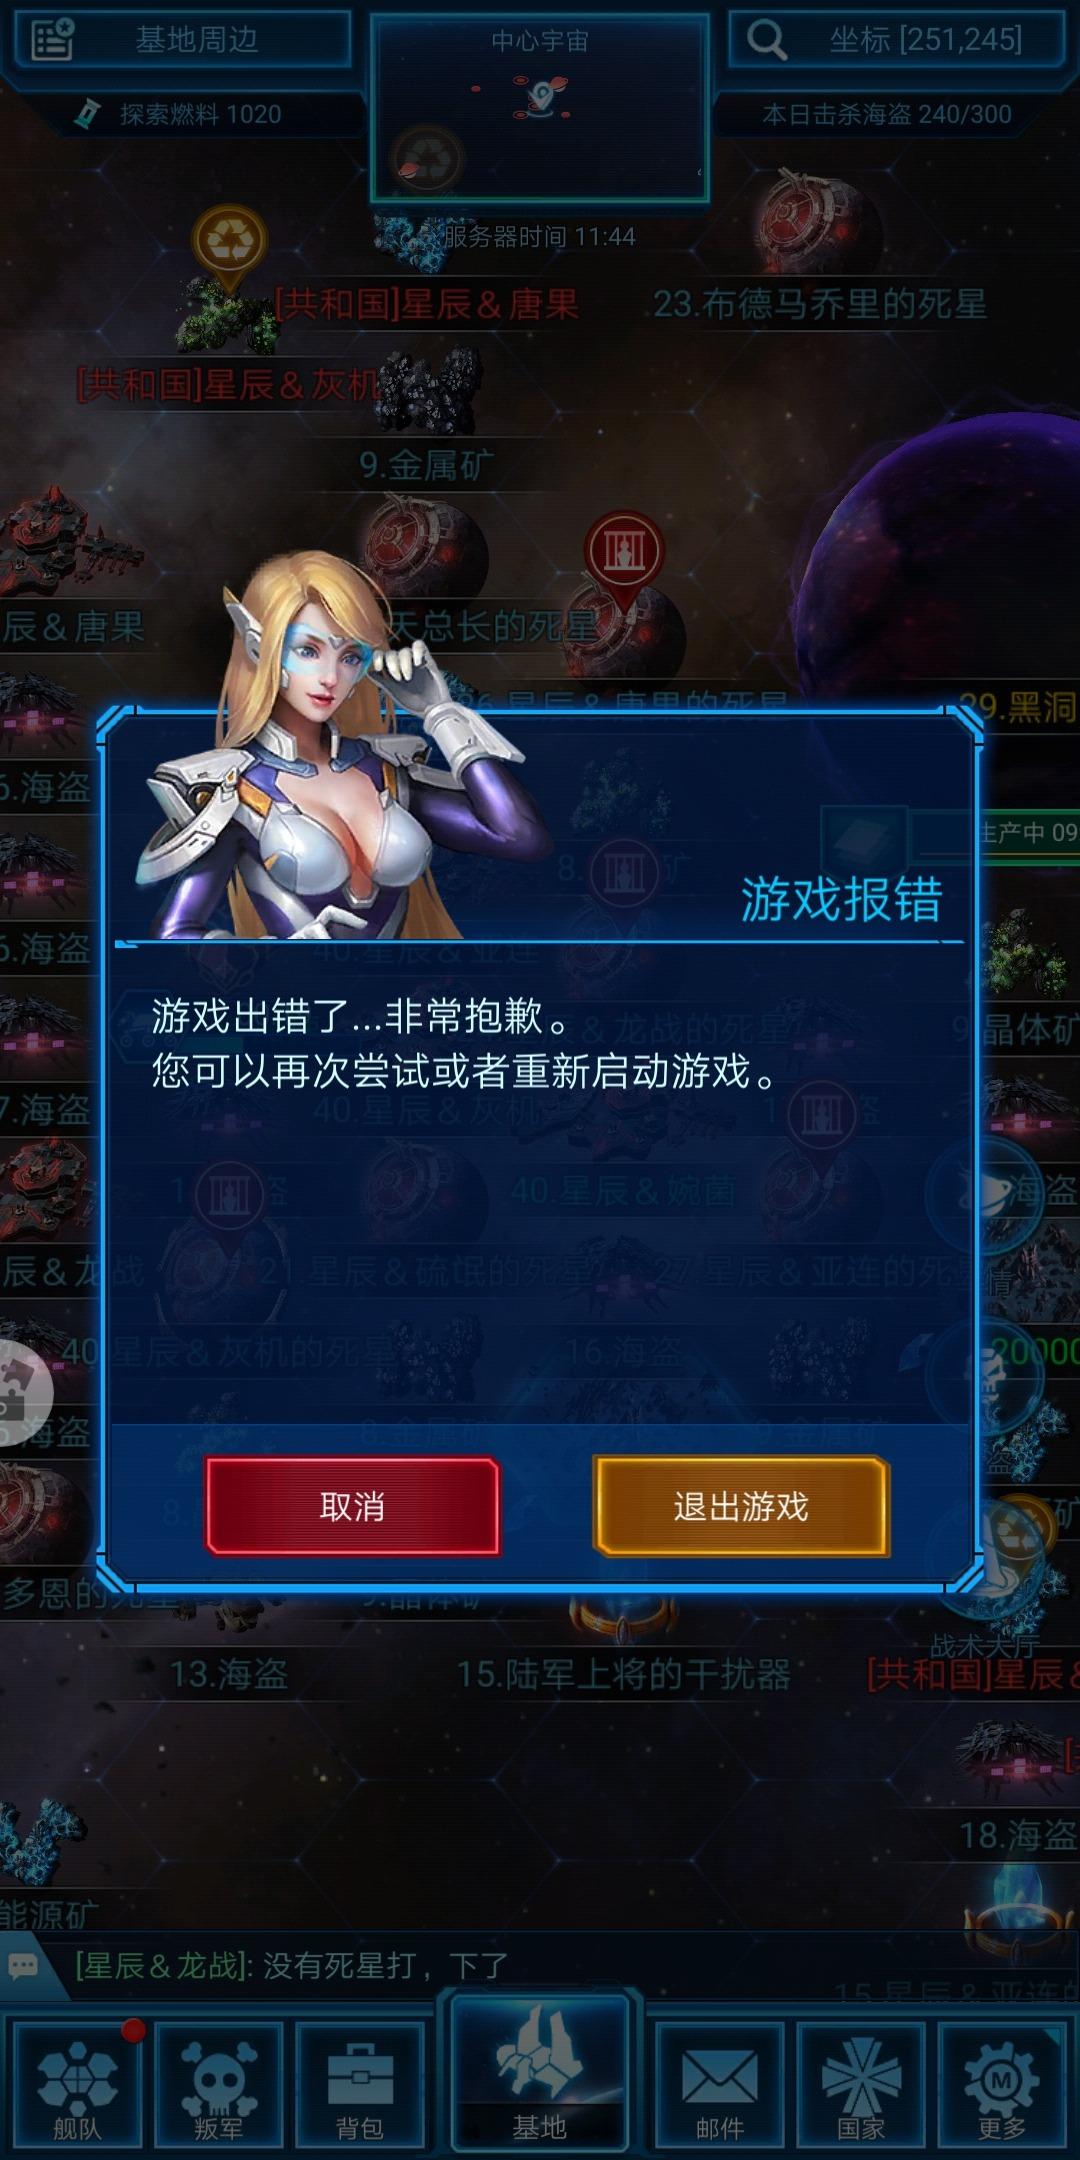 Screenshot_20191128_114401_com.jedigames.p16s.huawei.jpg